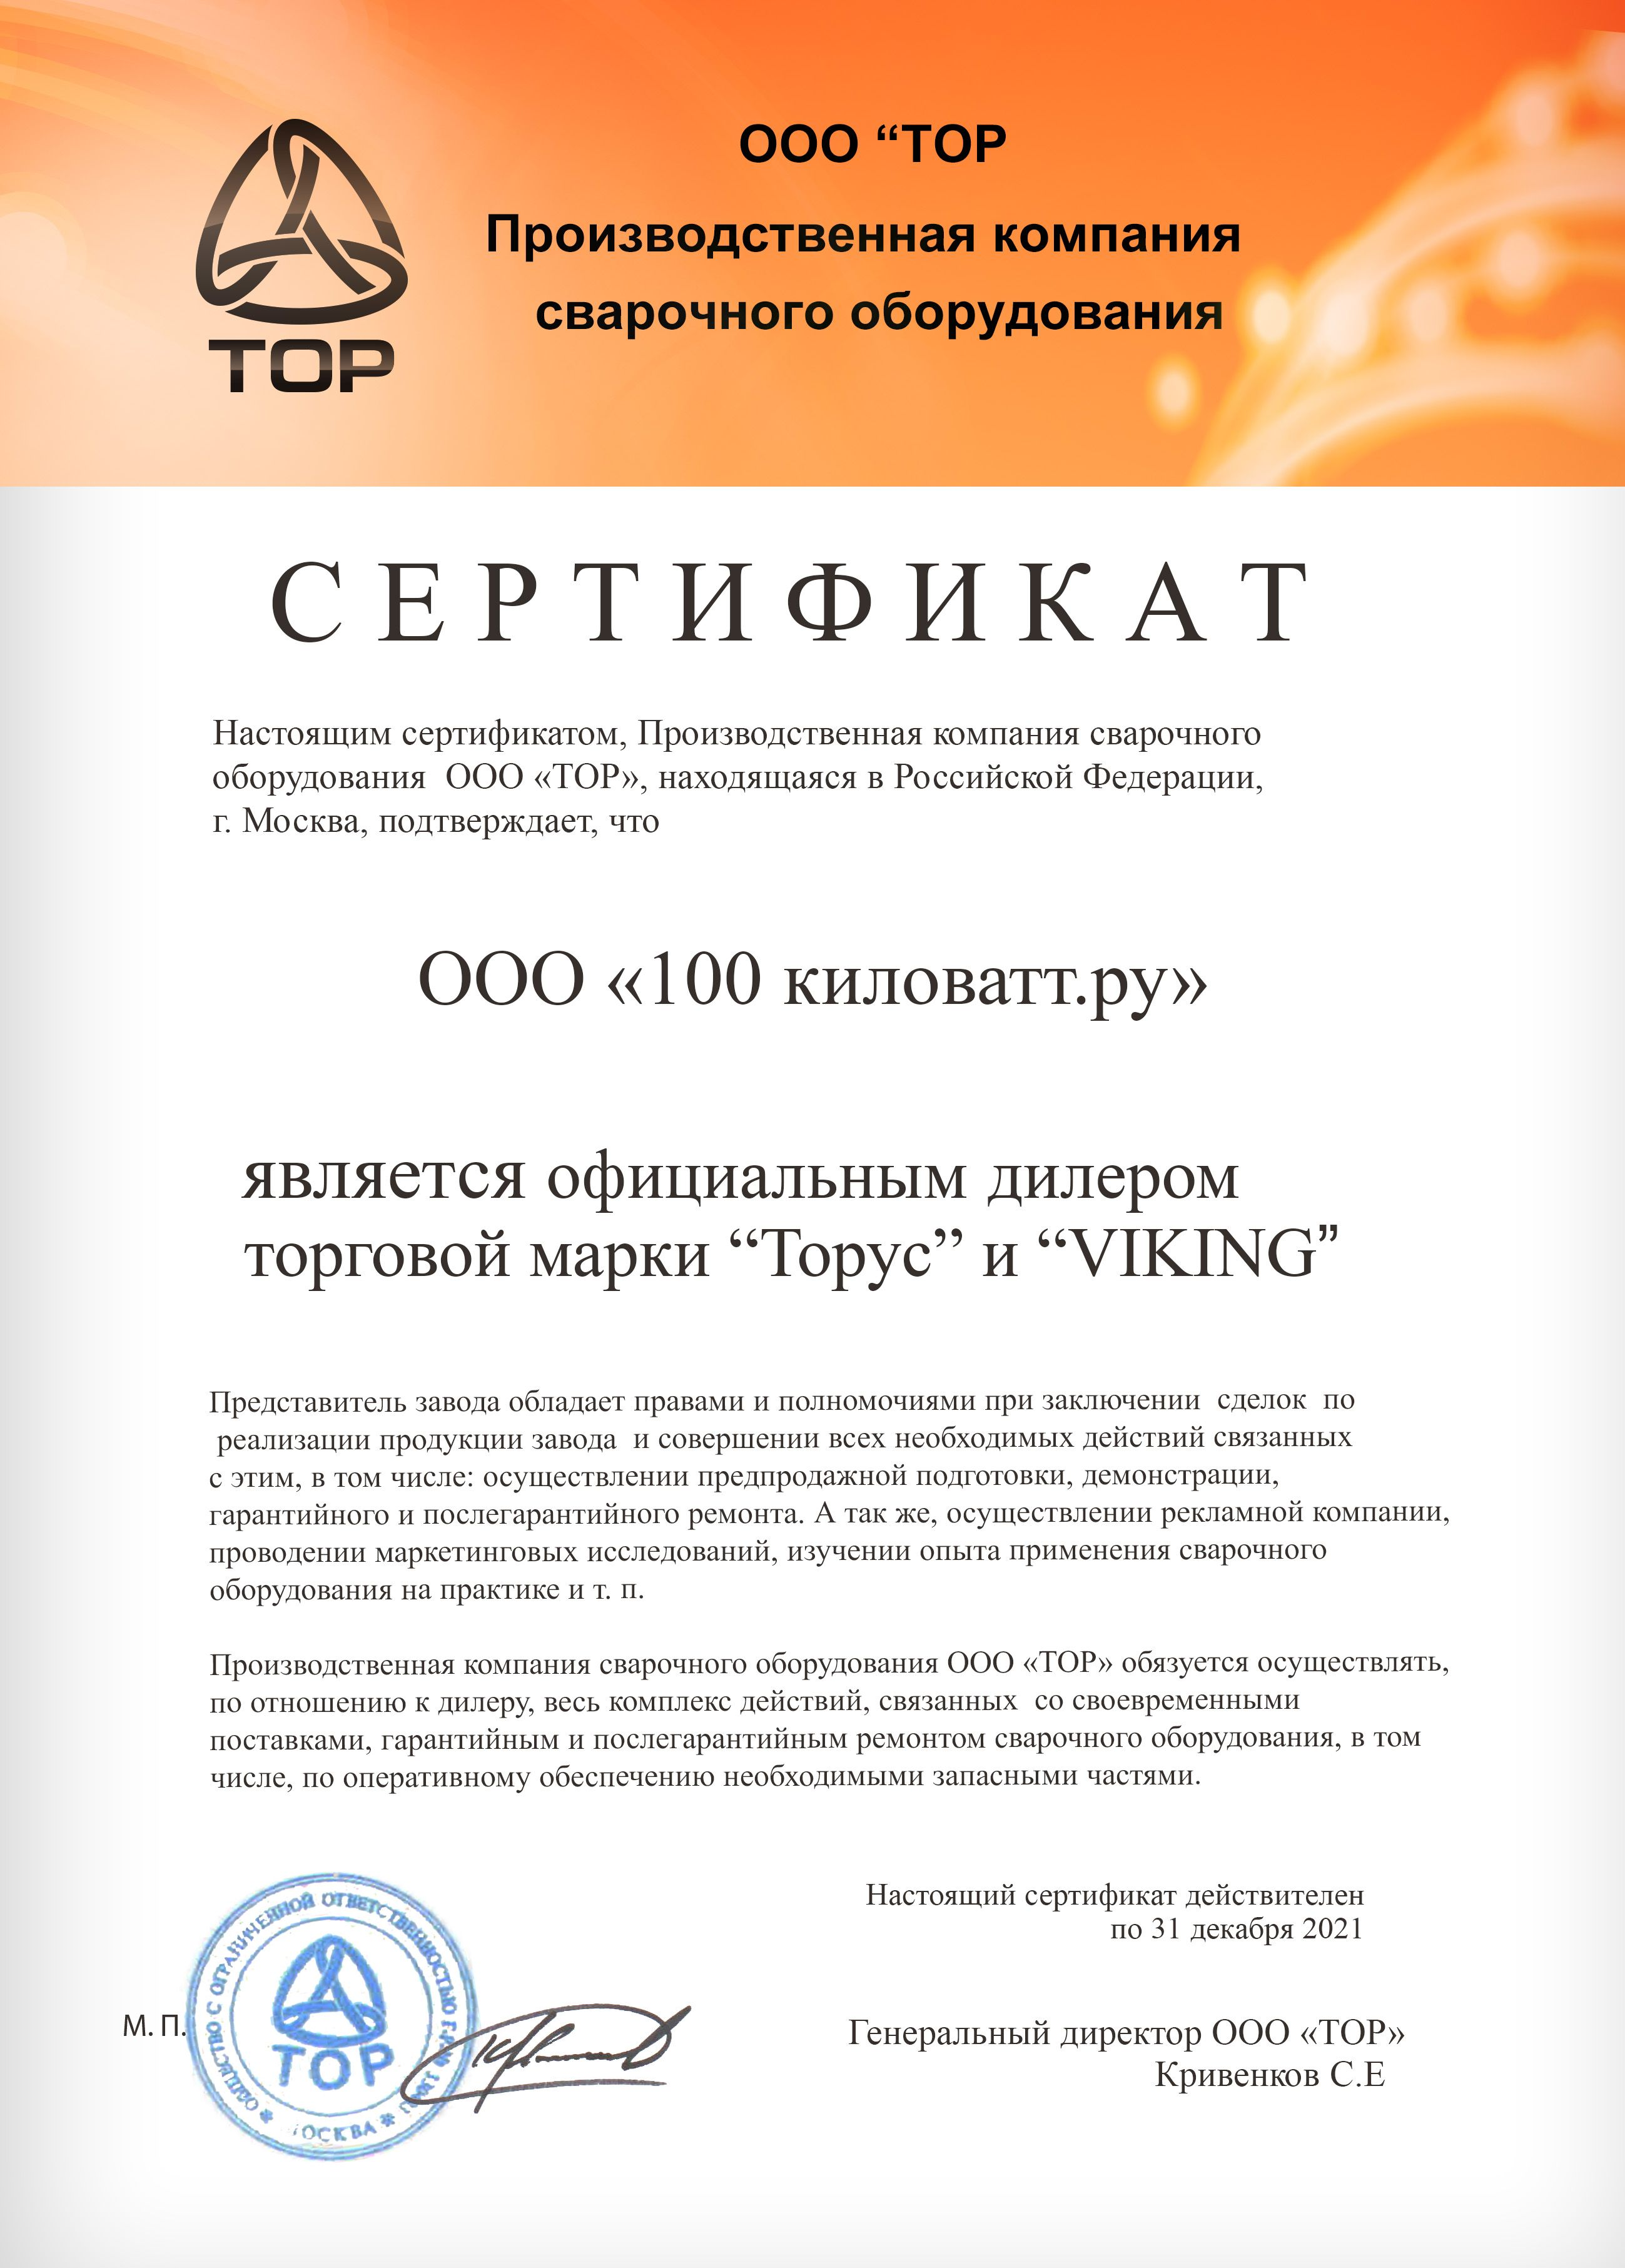 ТОРУС, VIKING - Сертификат дилера